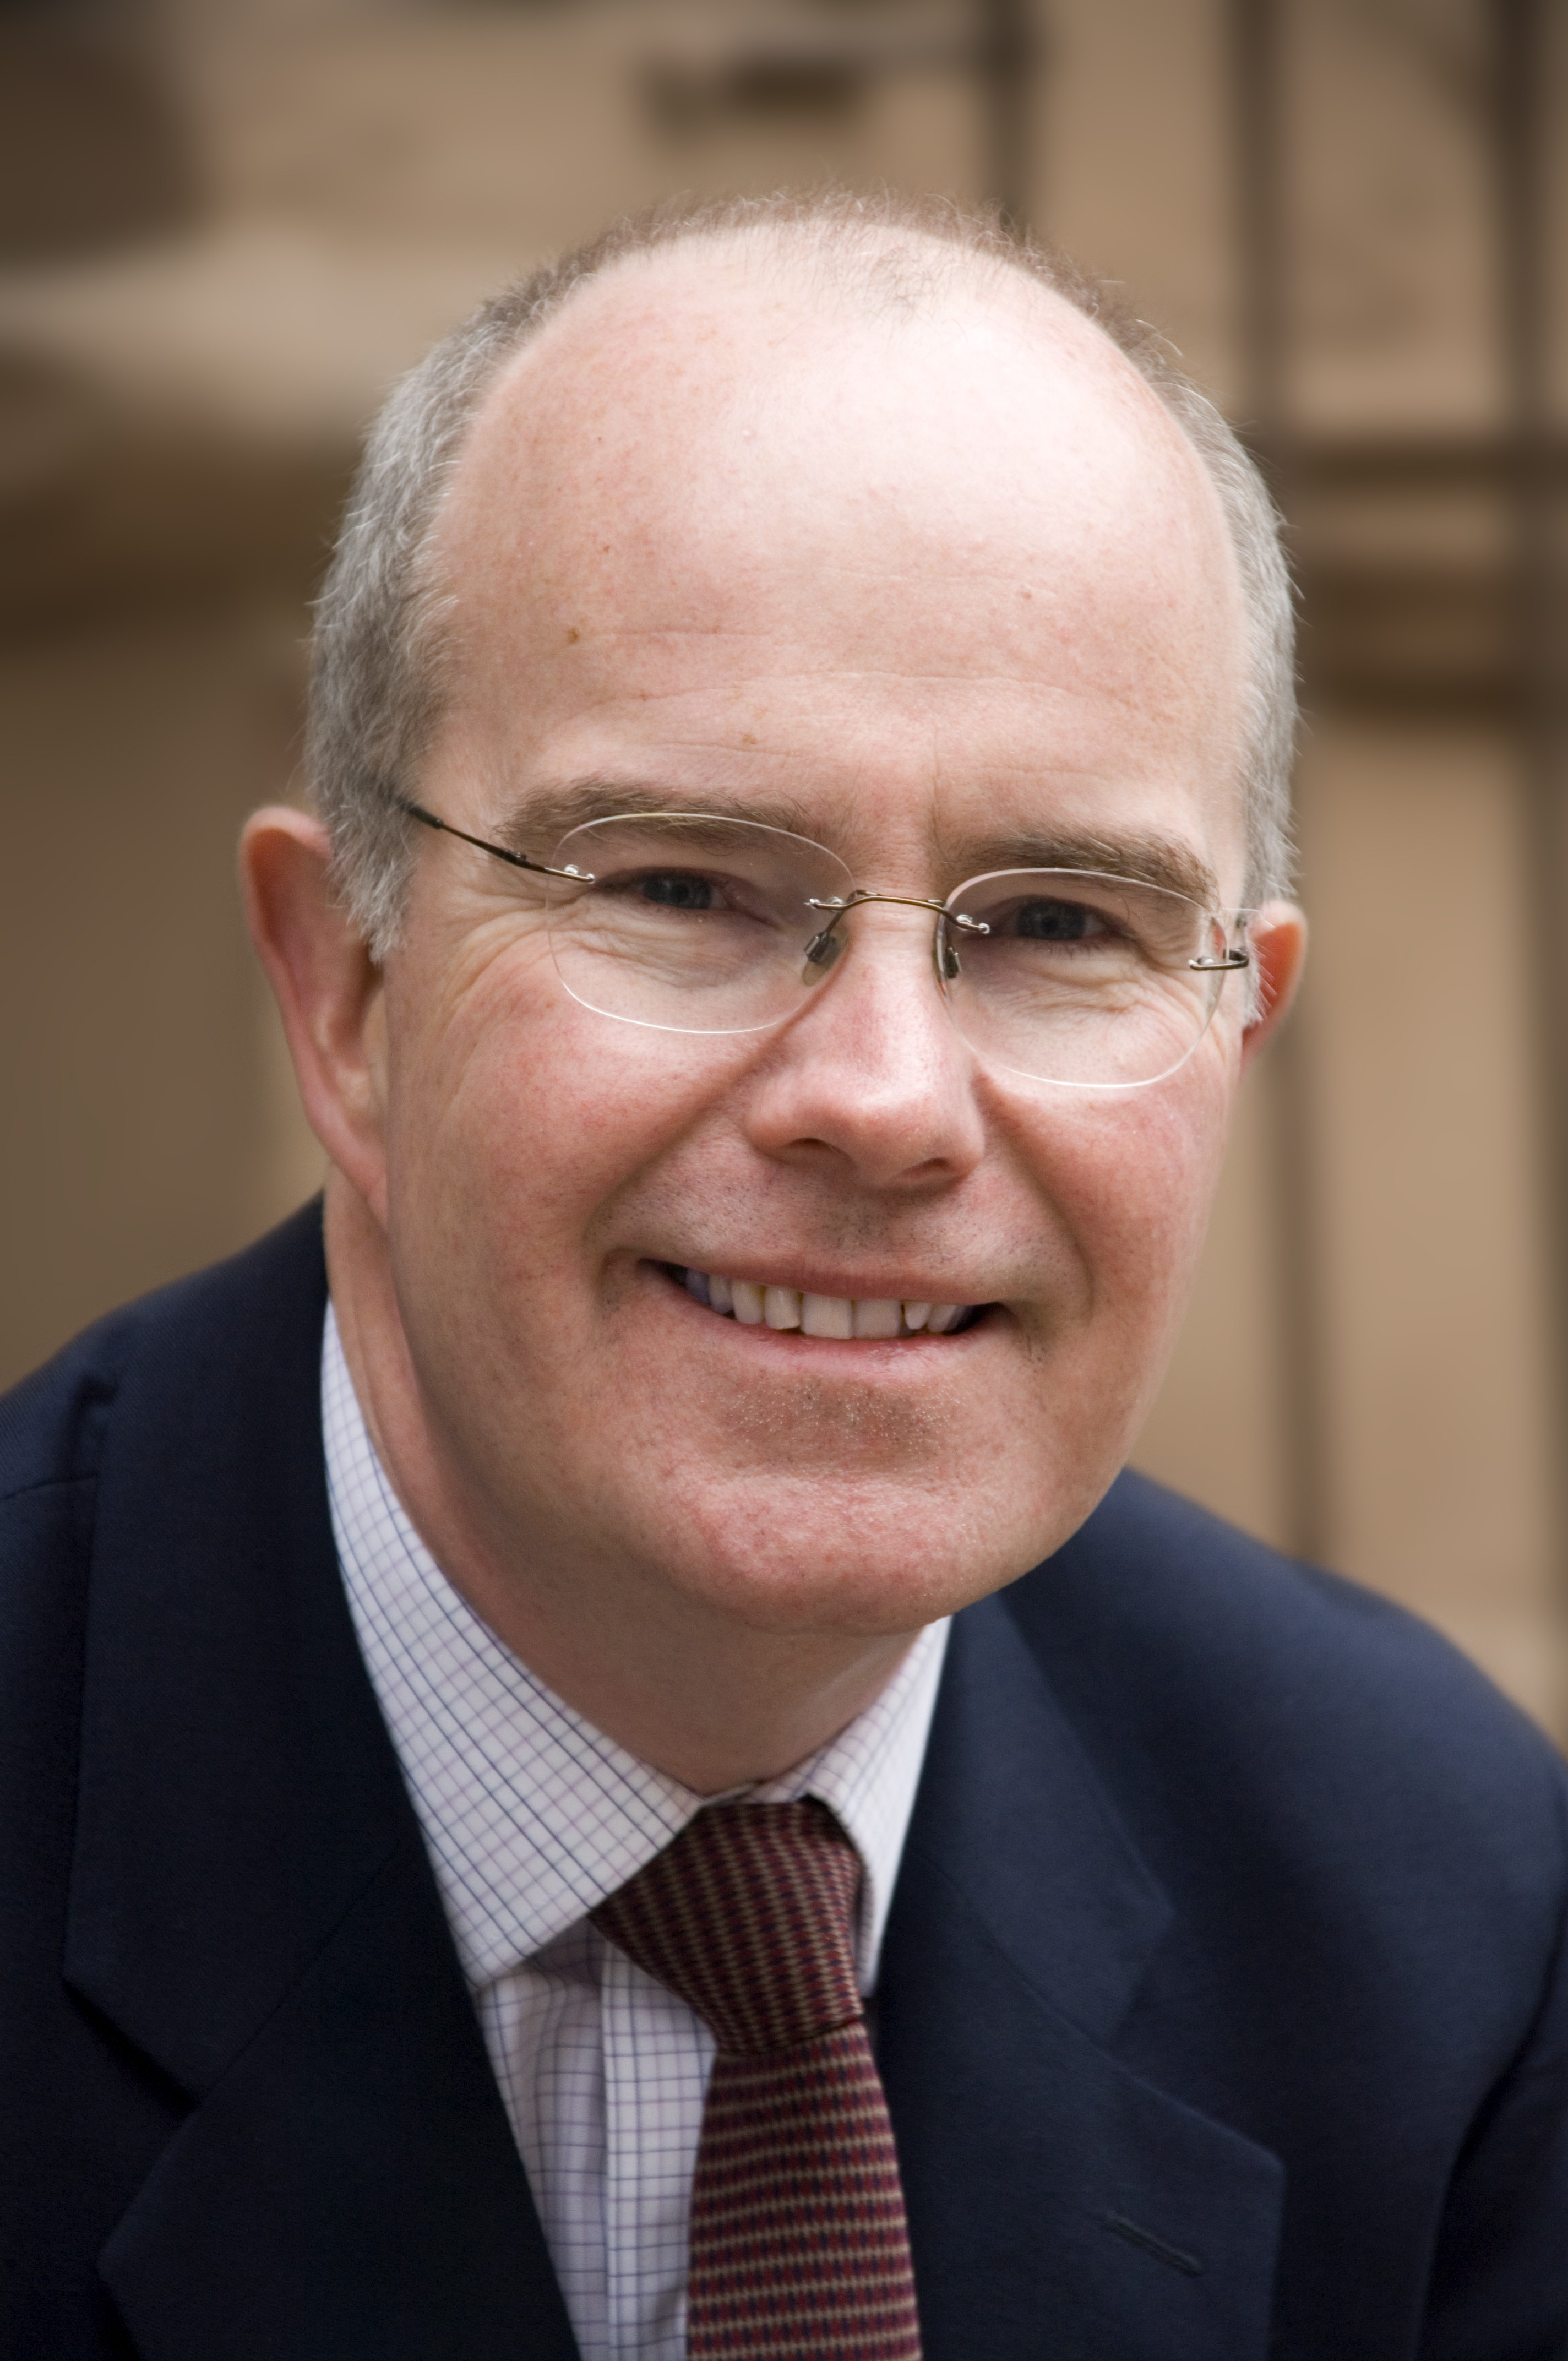 Terry Sheridan